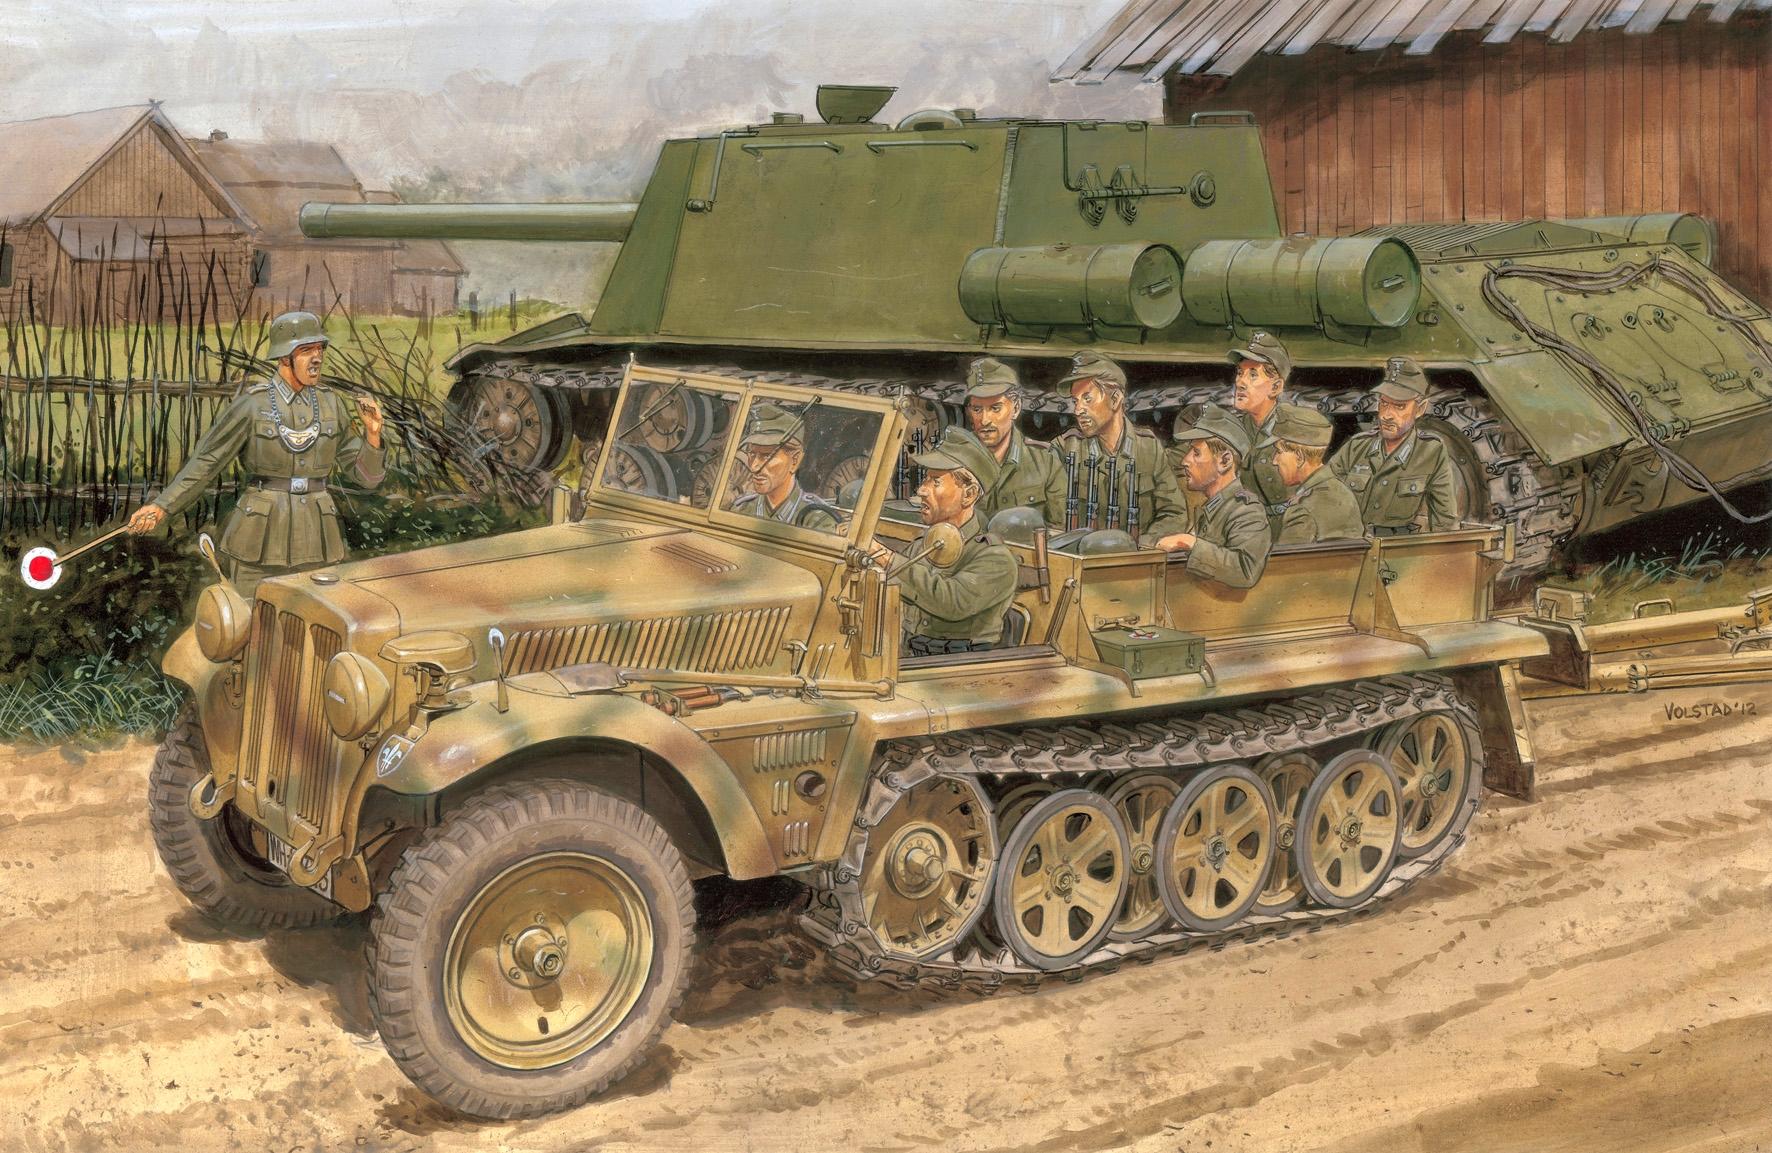 Volstad Ronald. Полугусеничный тягач Sd.Kfz.10 Ausf. B.